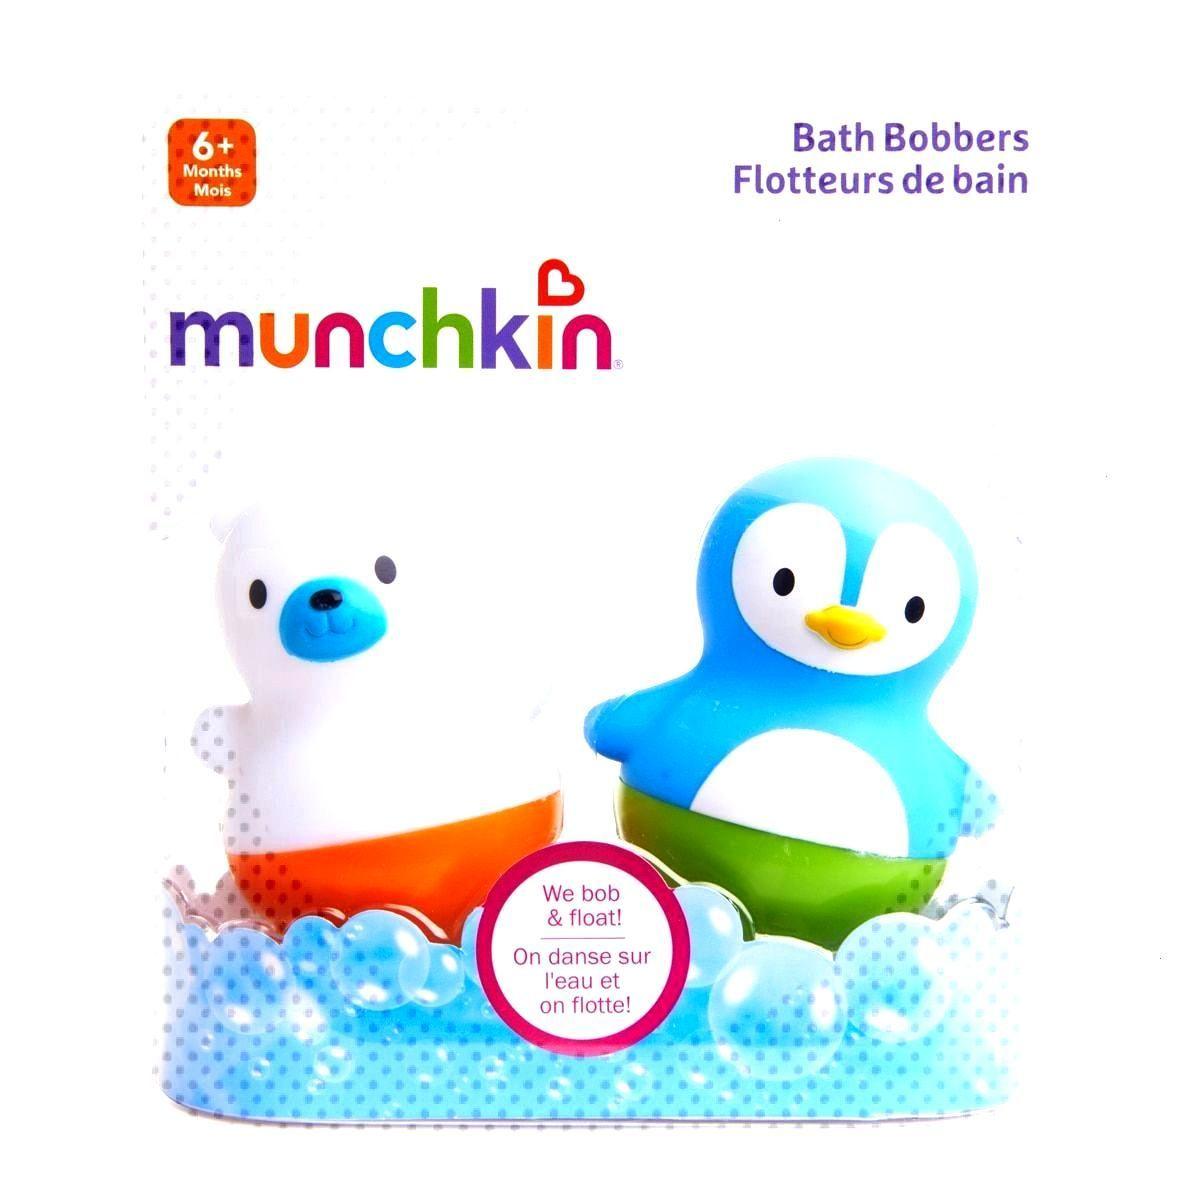 Bobbers baby bath toys     duckbathroomBath Bobbers baby bath toys     duckbathroomBath Bobber...Ba